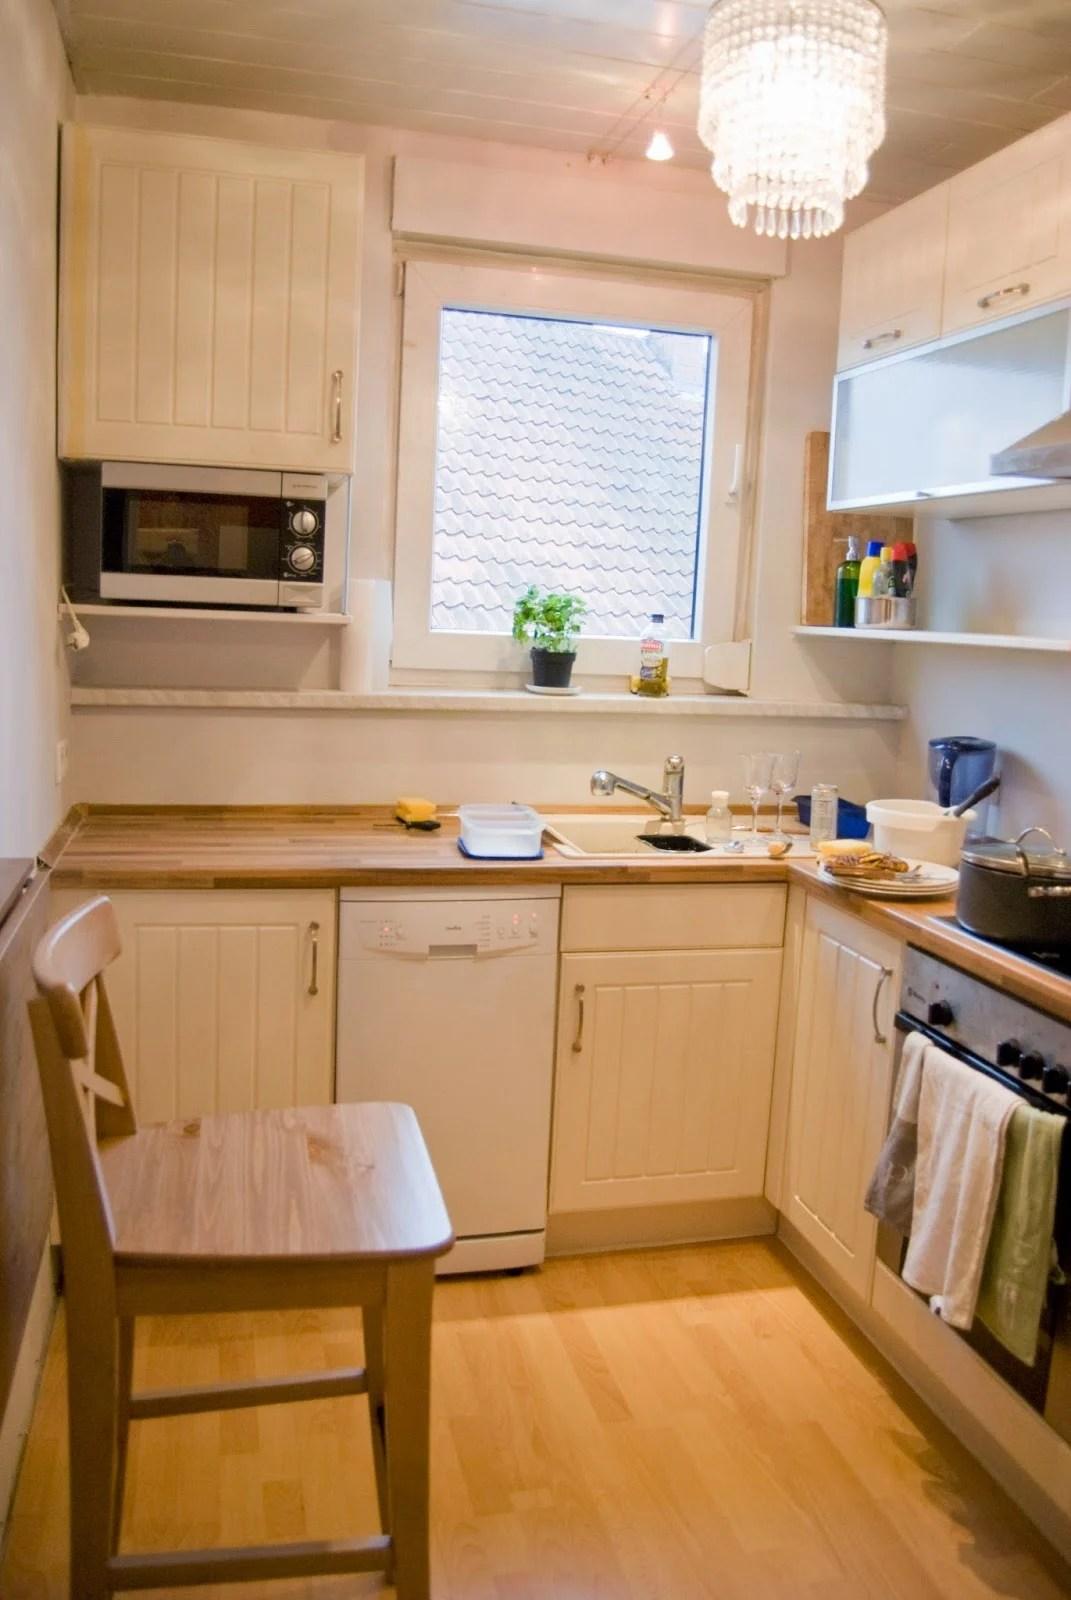 faux brick kitchen backsplash added lights faux brick wall kitchen faux brick backsplash kitchen faux brick